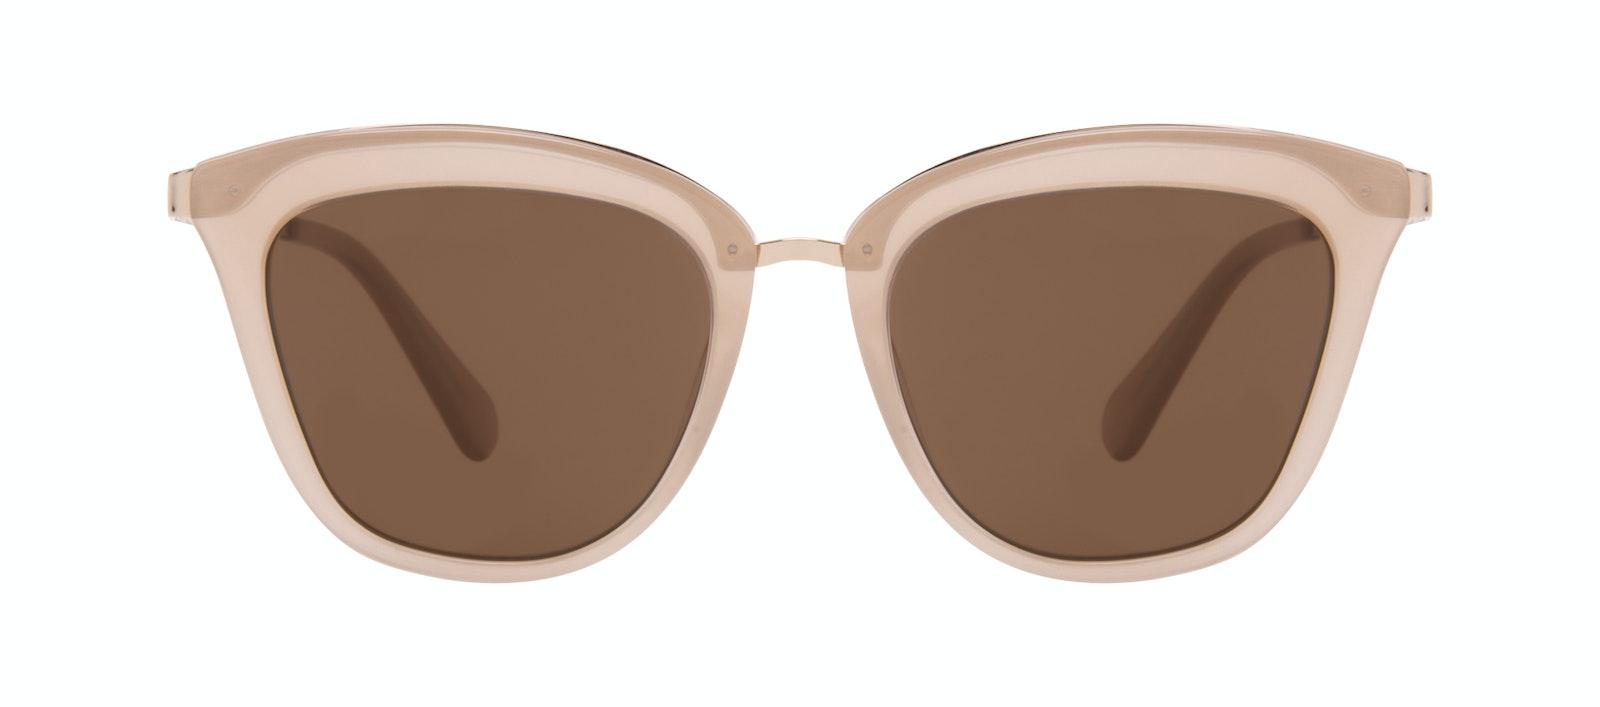 Affordable Fashion Glasses Cat Eye Sunglasses Women More Petite Bone Front